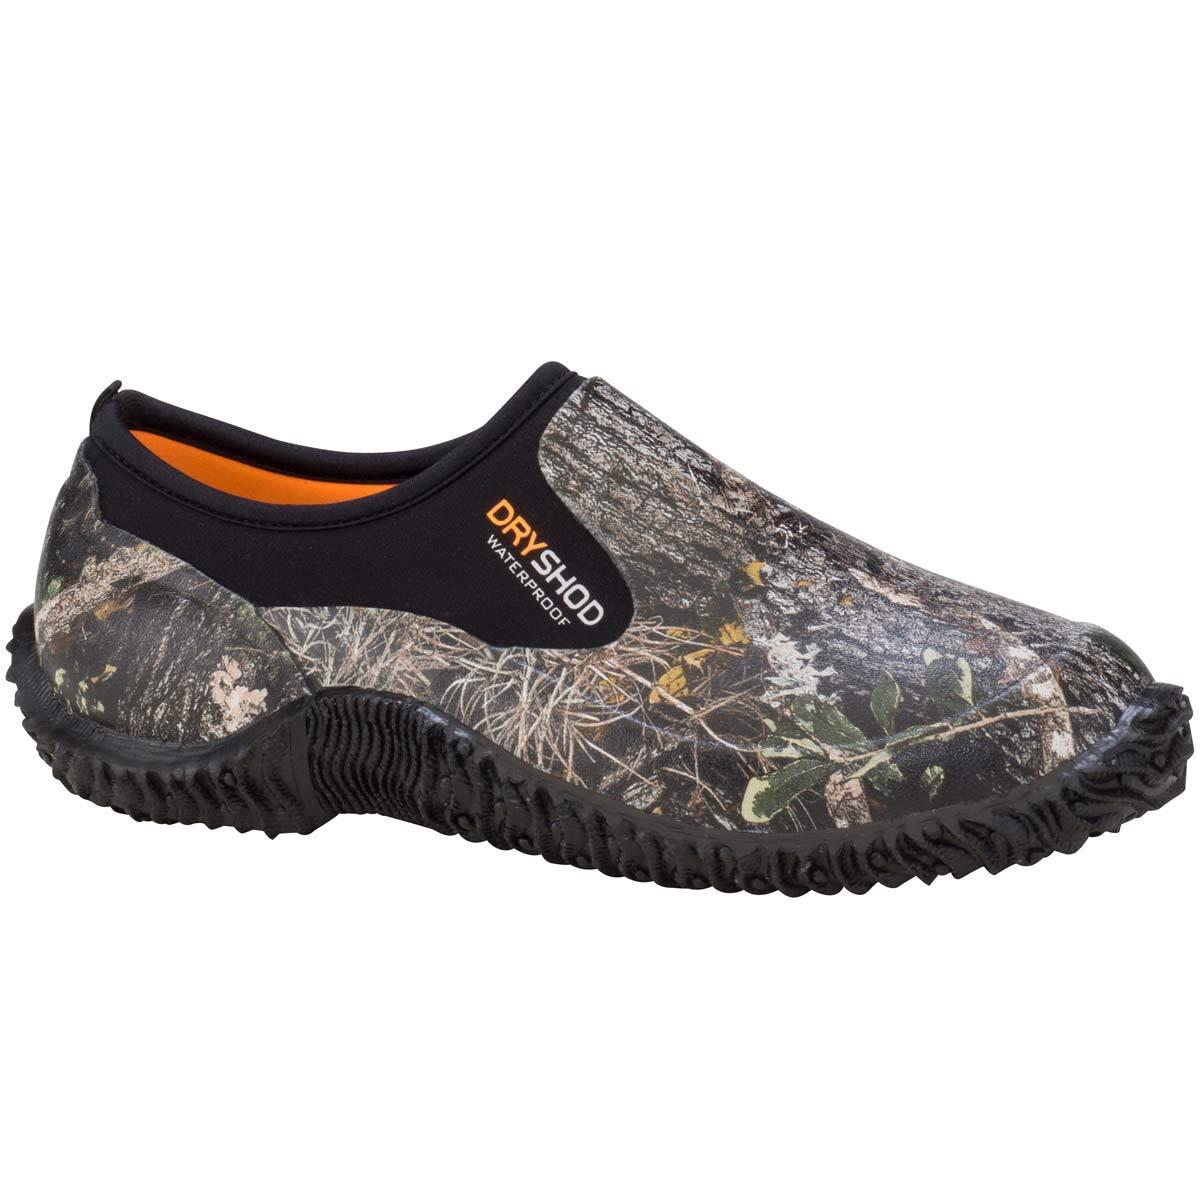 Mens 7 Dryshod Legend Camp Shoe in Camo//Black